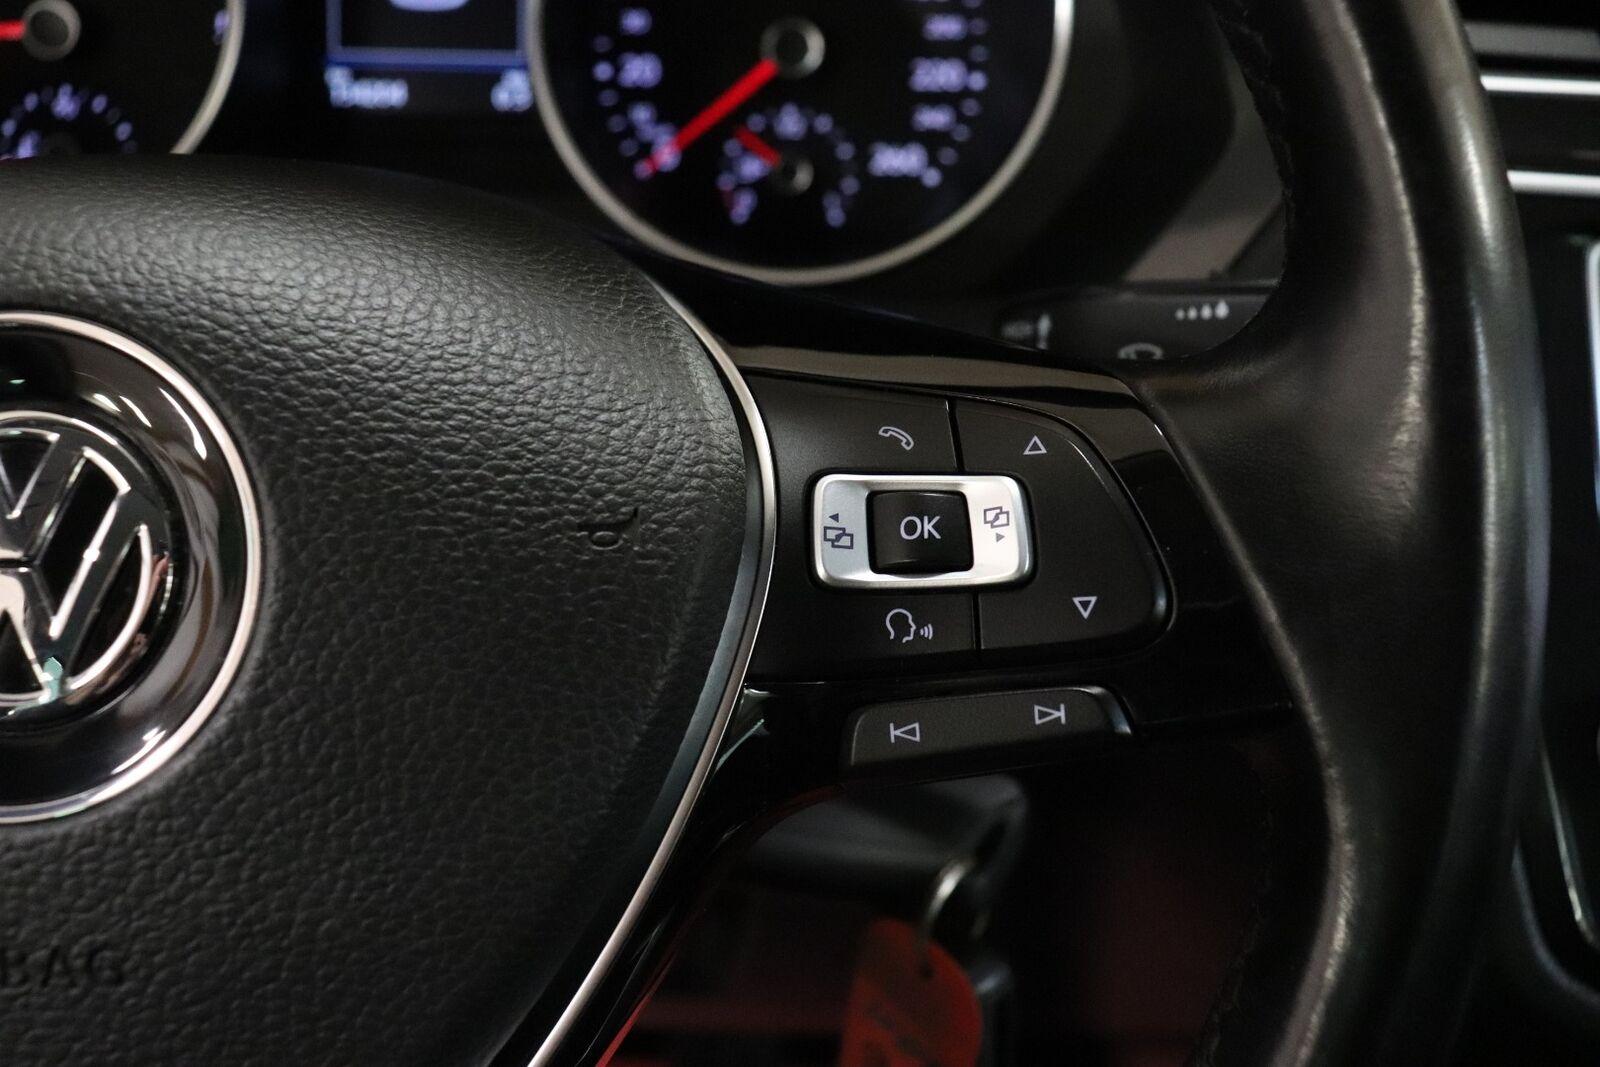 VW Tiguan 2,0 TDi 150 Comfortline